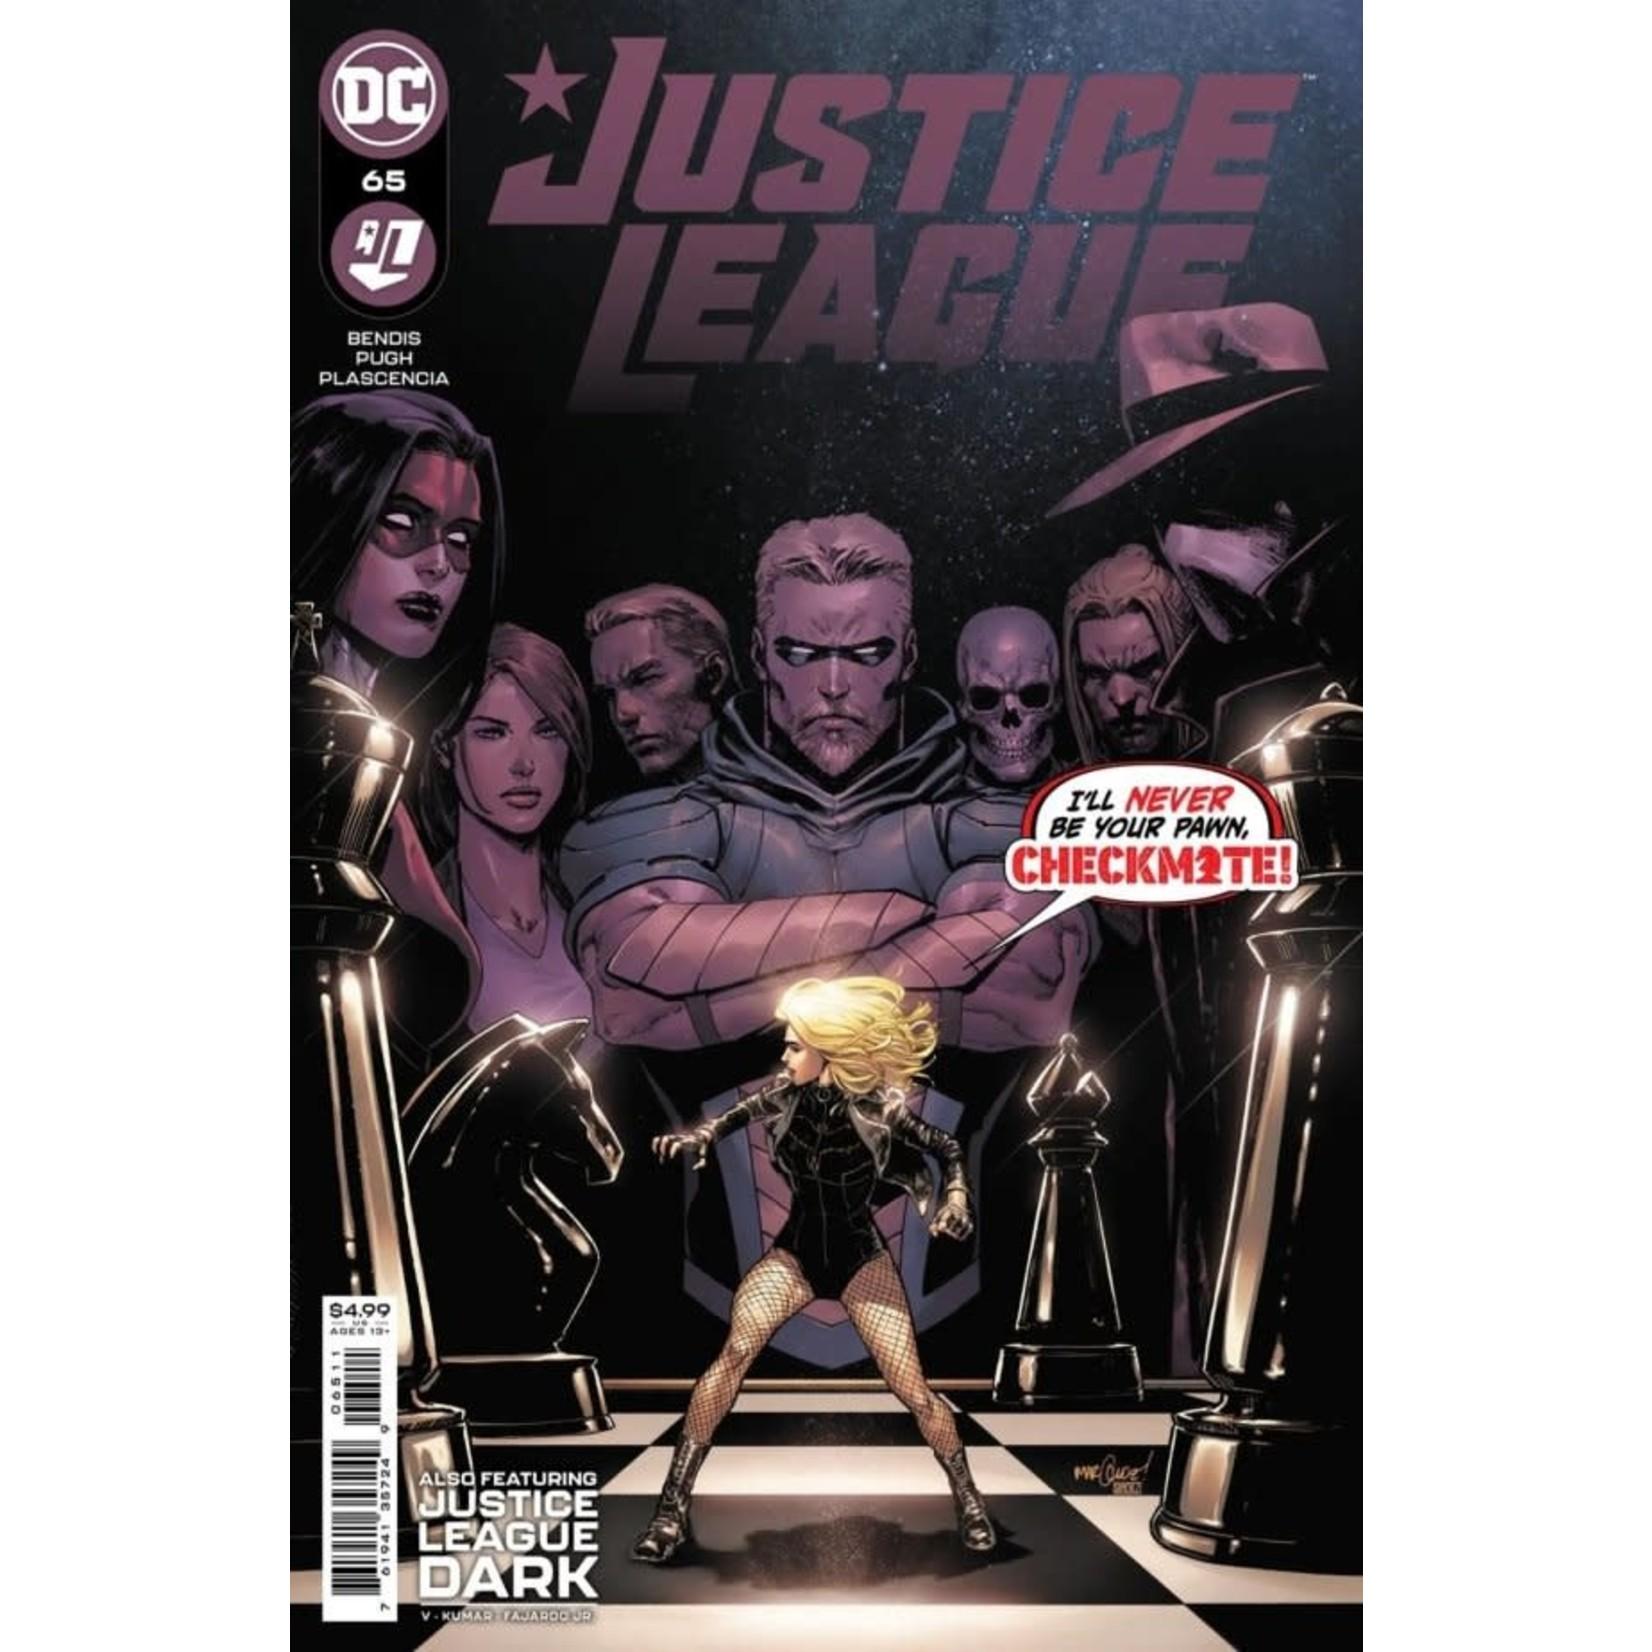 DC Comics Justice League #65